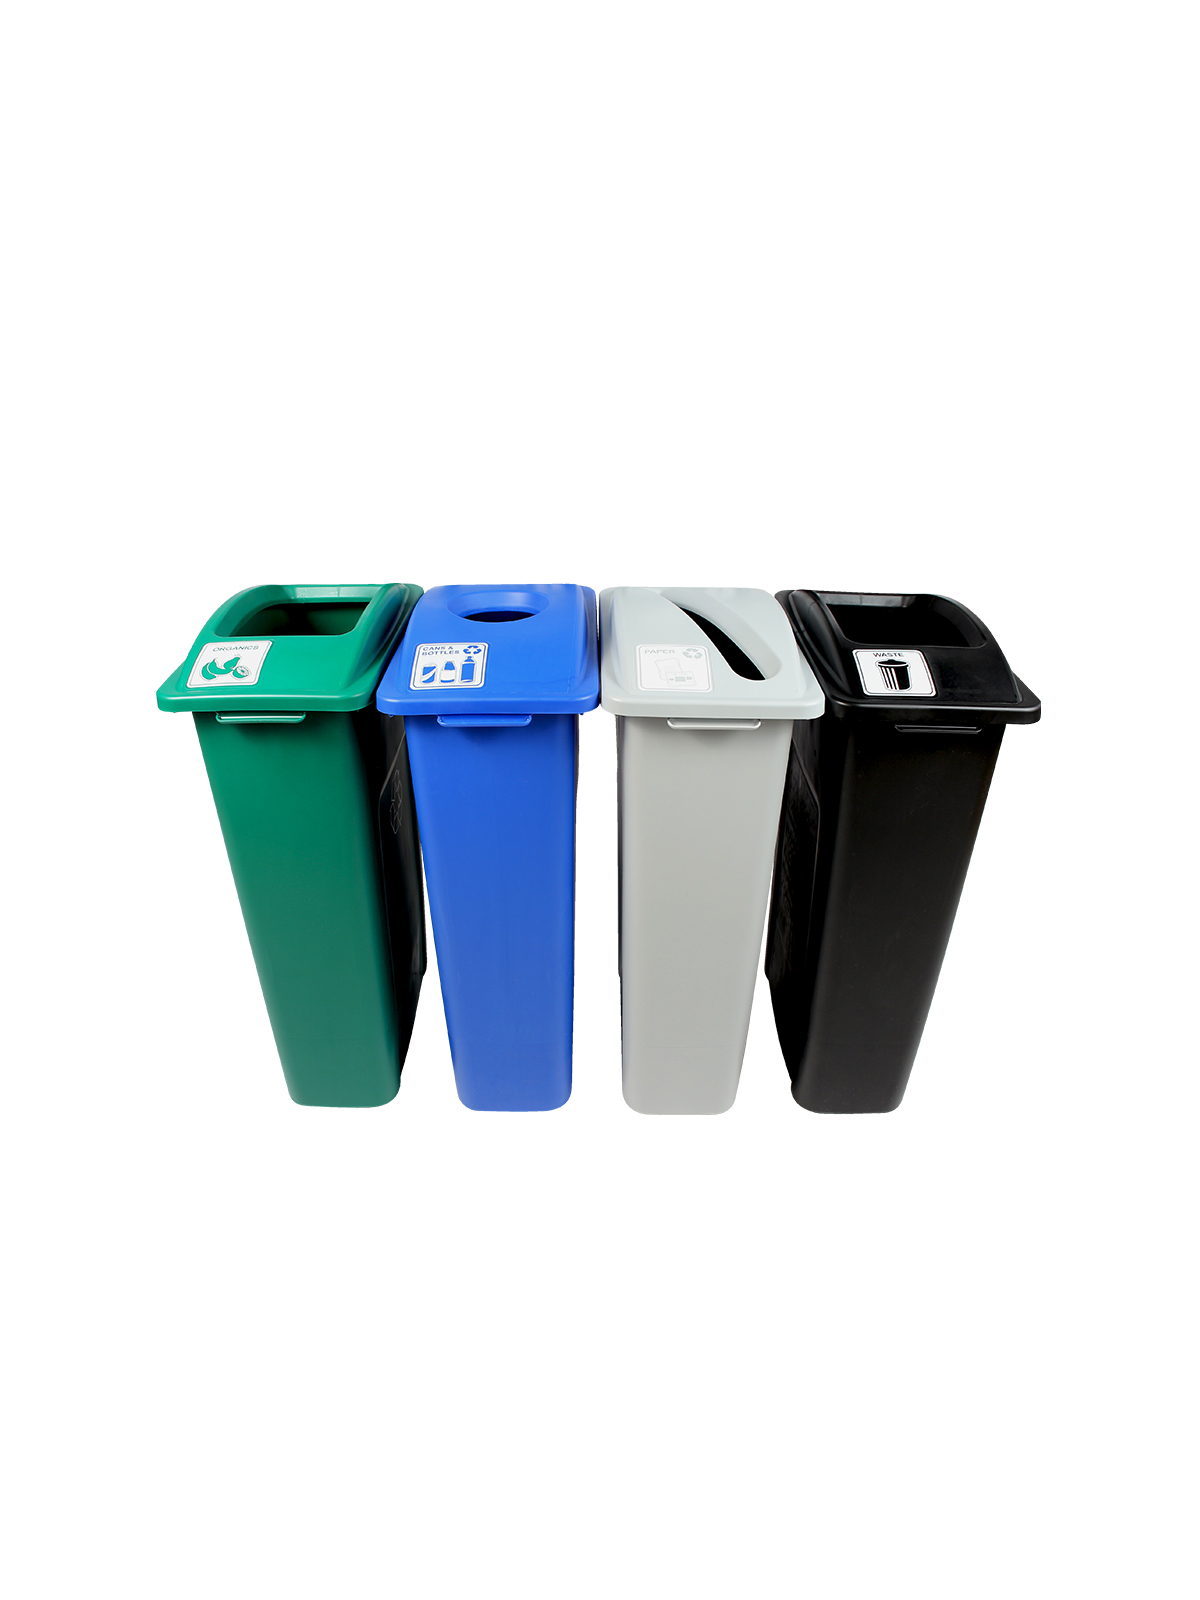 WASTE WATCHER - Quad - Cans & Bottles-Paper-Organics-Waste - Circle-Slot-Full - Blue-Grey-Green-Black